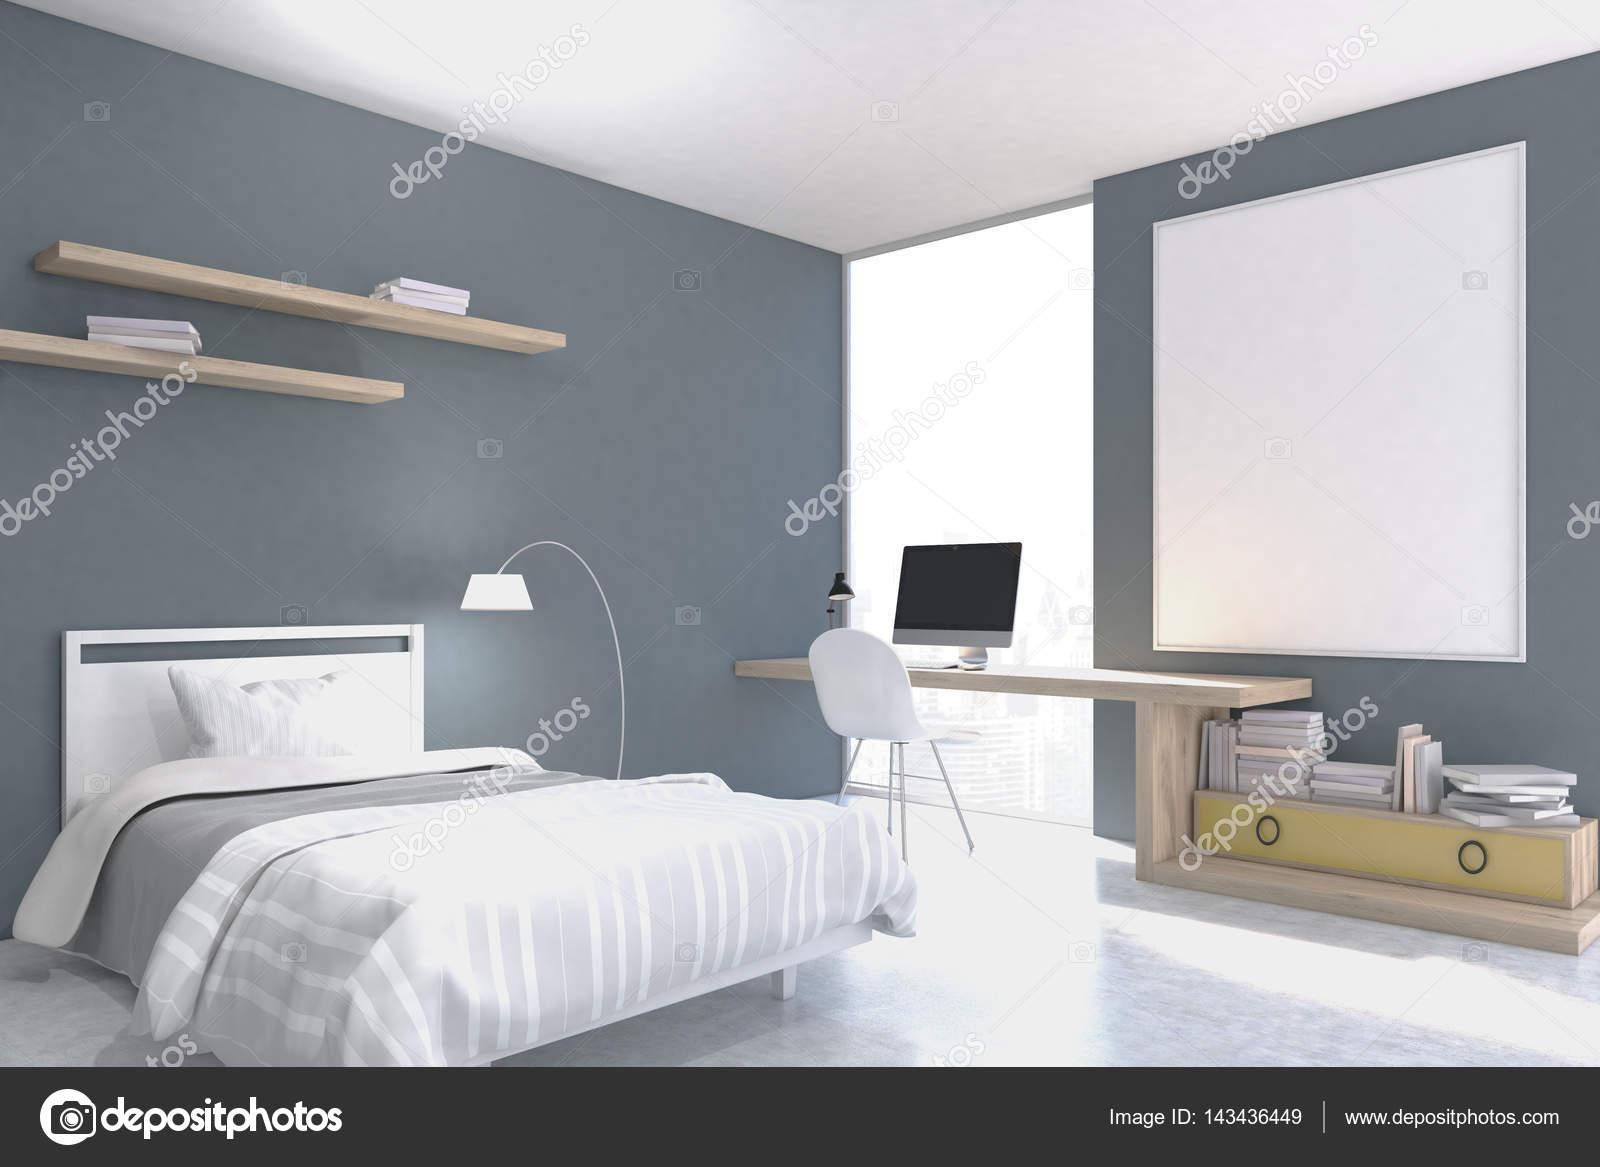 https://st3.depositphotos.com/2673929/14343/i/1600/depositphotos_143436449-stock-photo-gray-walled-bedroom-with-study.jpg